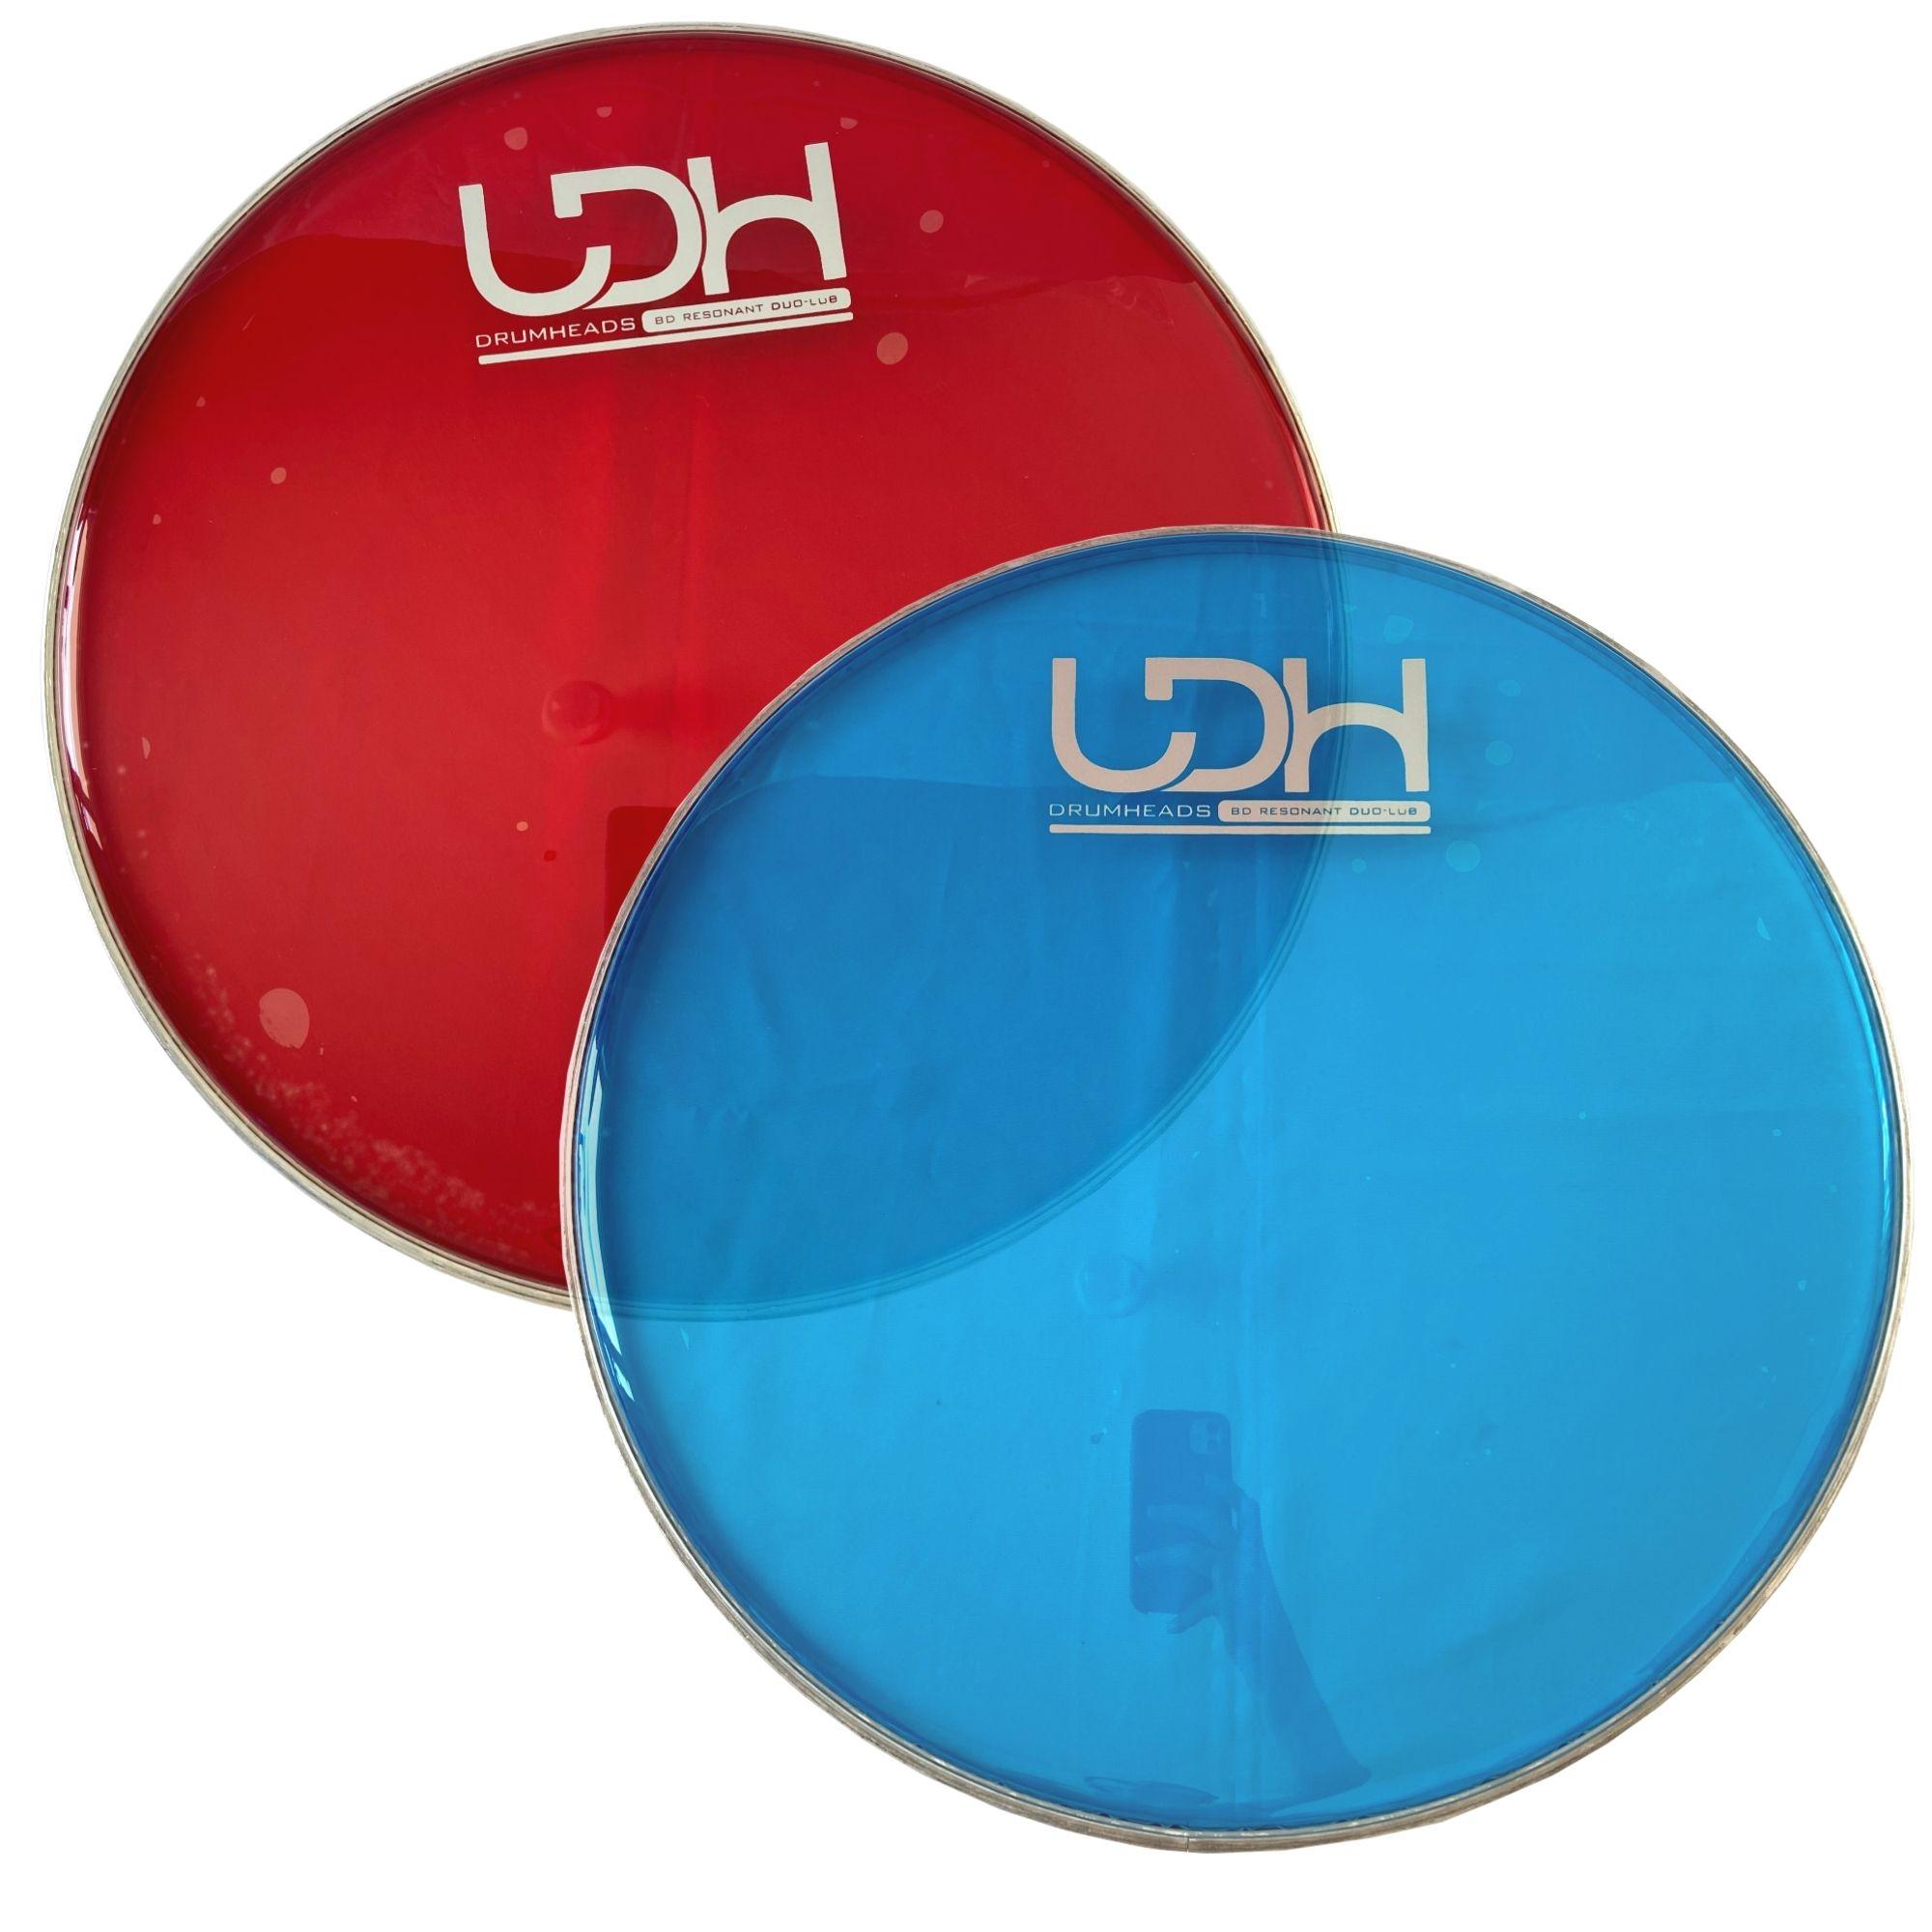 "Pele Hidráulica Duo Lub BD Luen Drumheads LDH 22"" para Bumbo de Bateria."